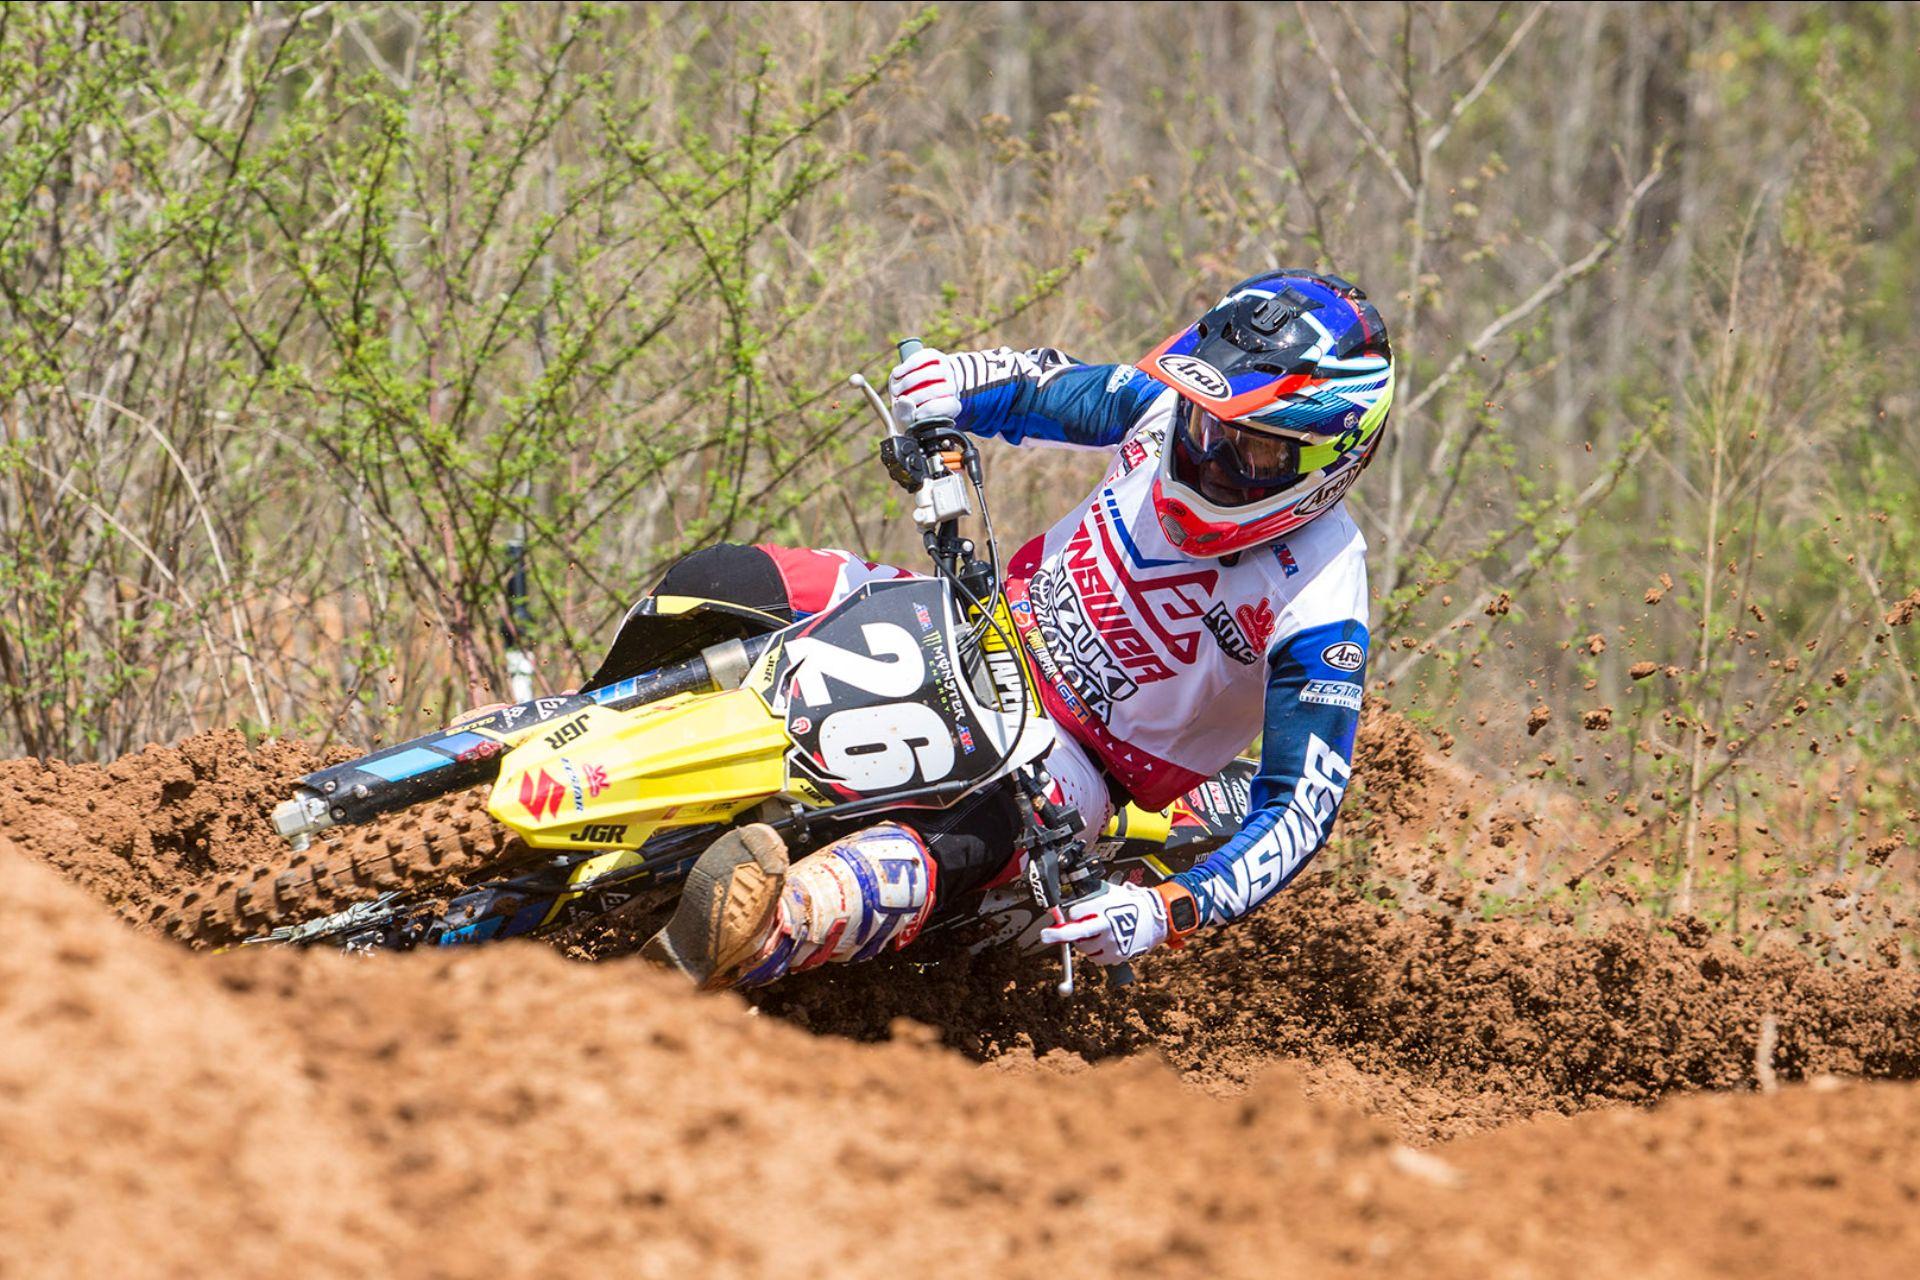 JGRMX/Yoshimura/Suzuki Factory Racing - Alex Martin #26